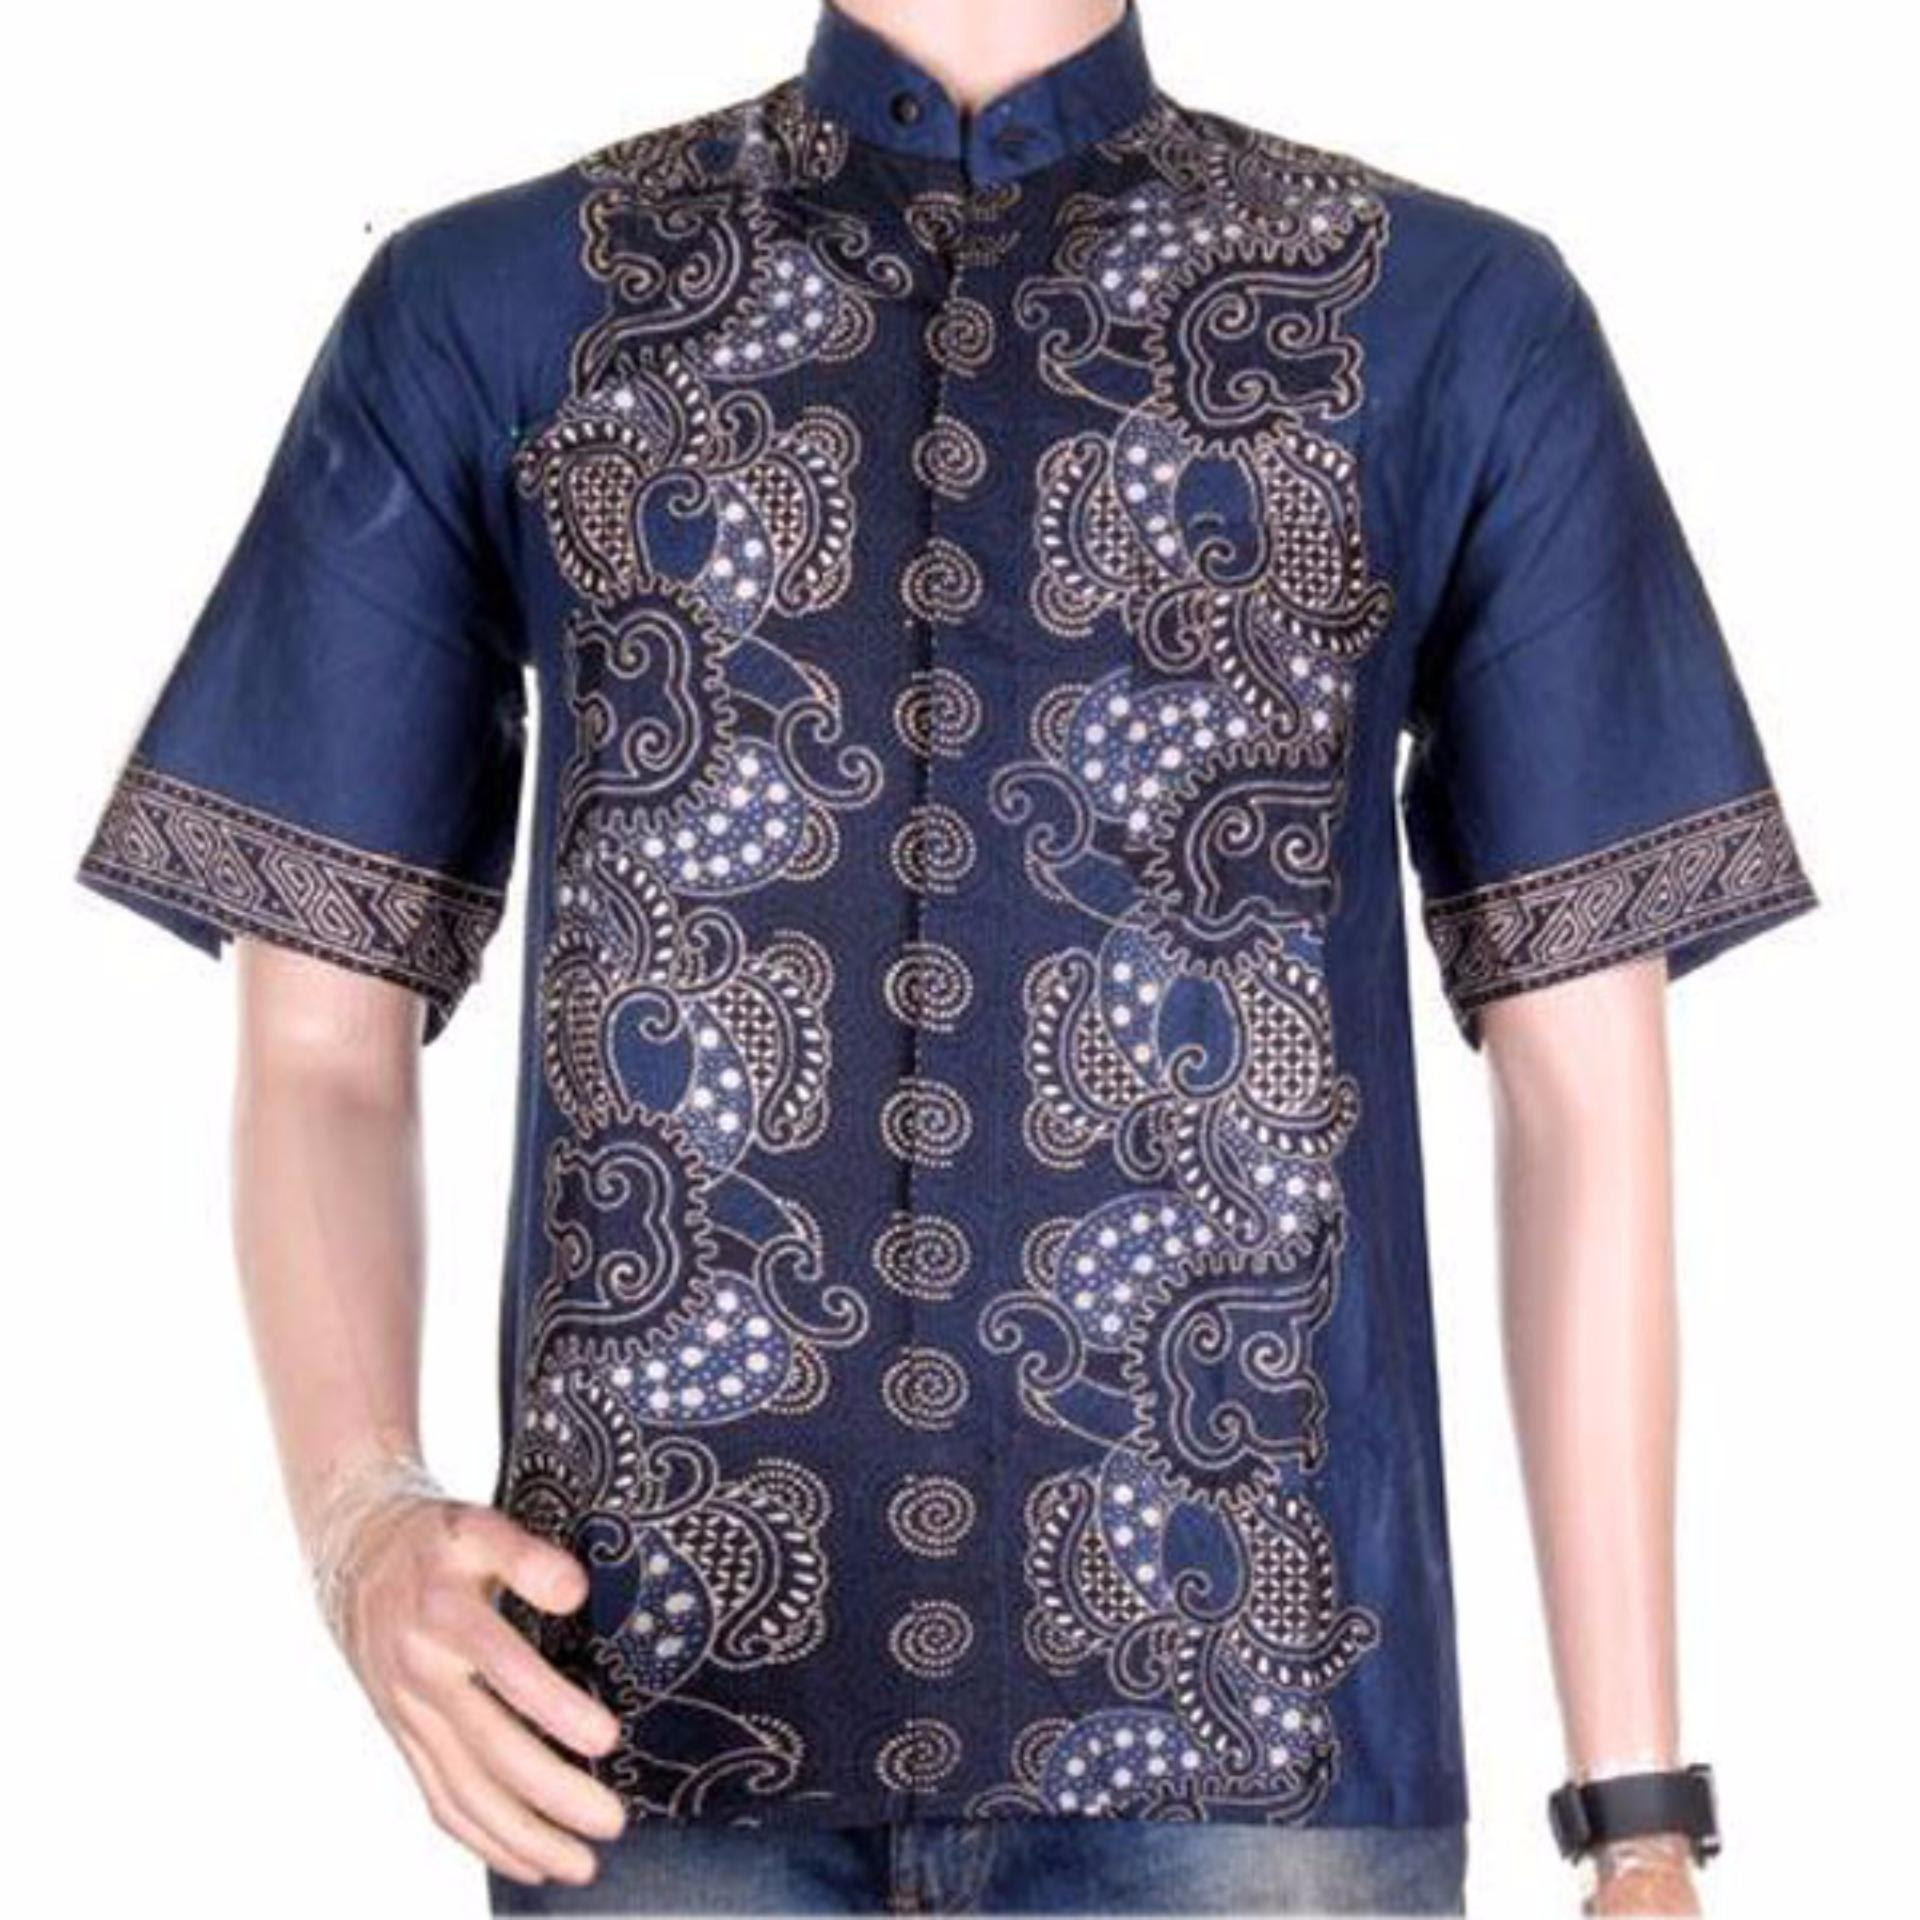 ... XL Lasido Baju Batik Koko Muslim Lengan Pendek ZO11 Kemeja Fashion Pria  Fashionable Shirt Clothes Man Katun af0835ed98